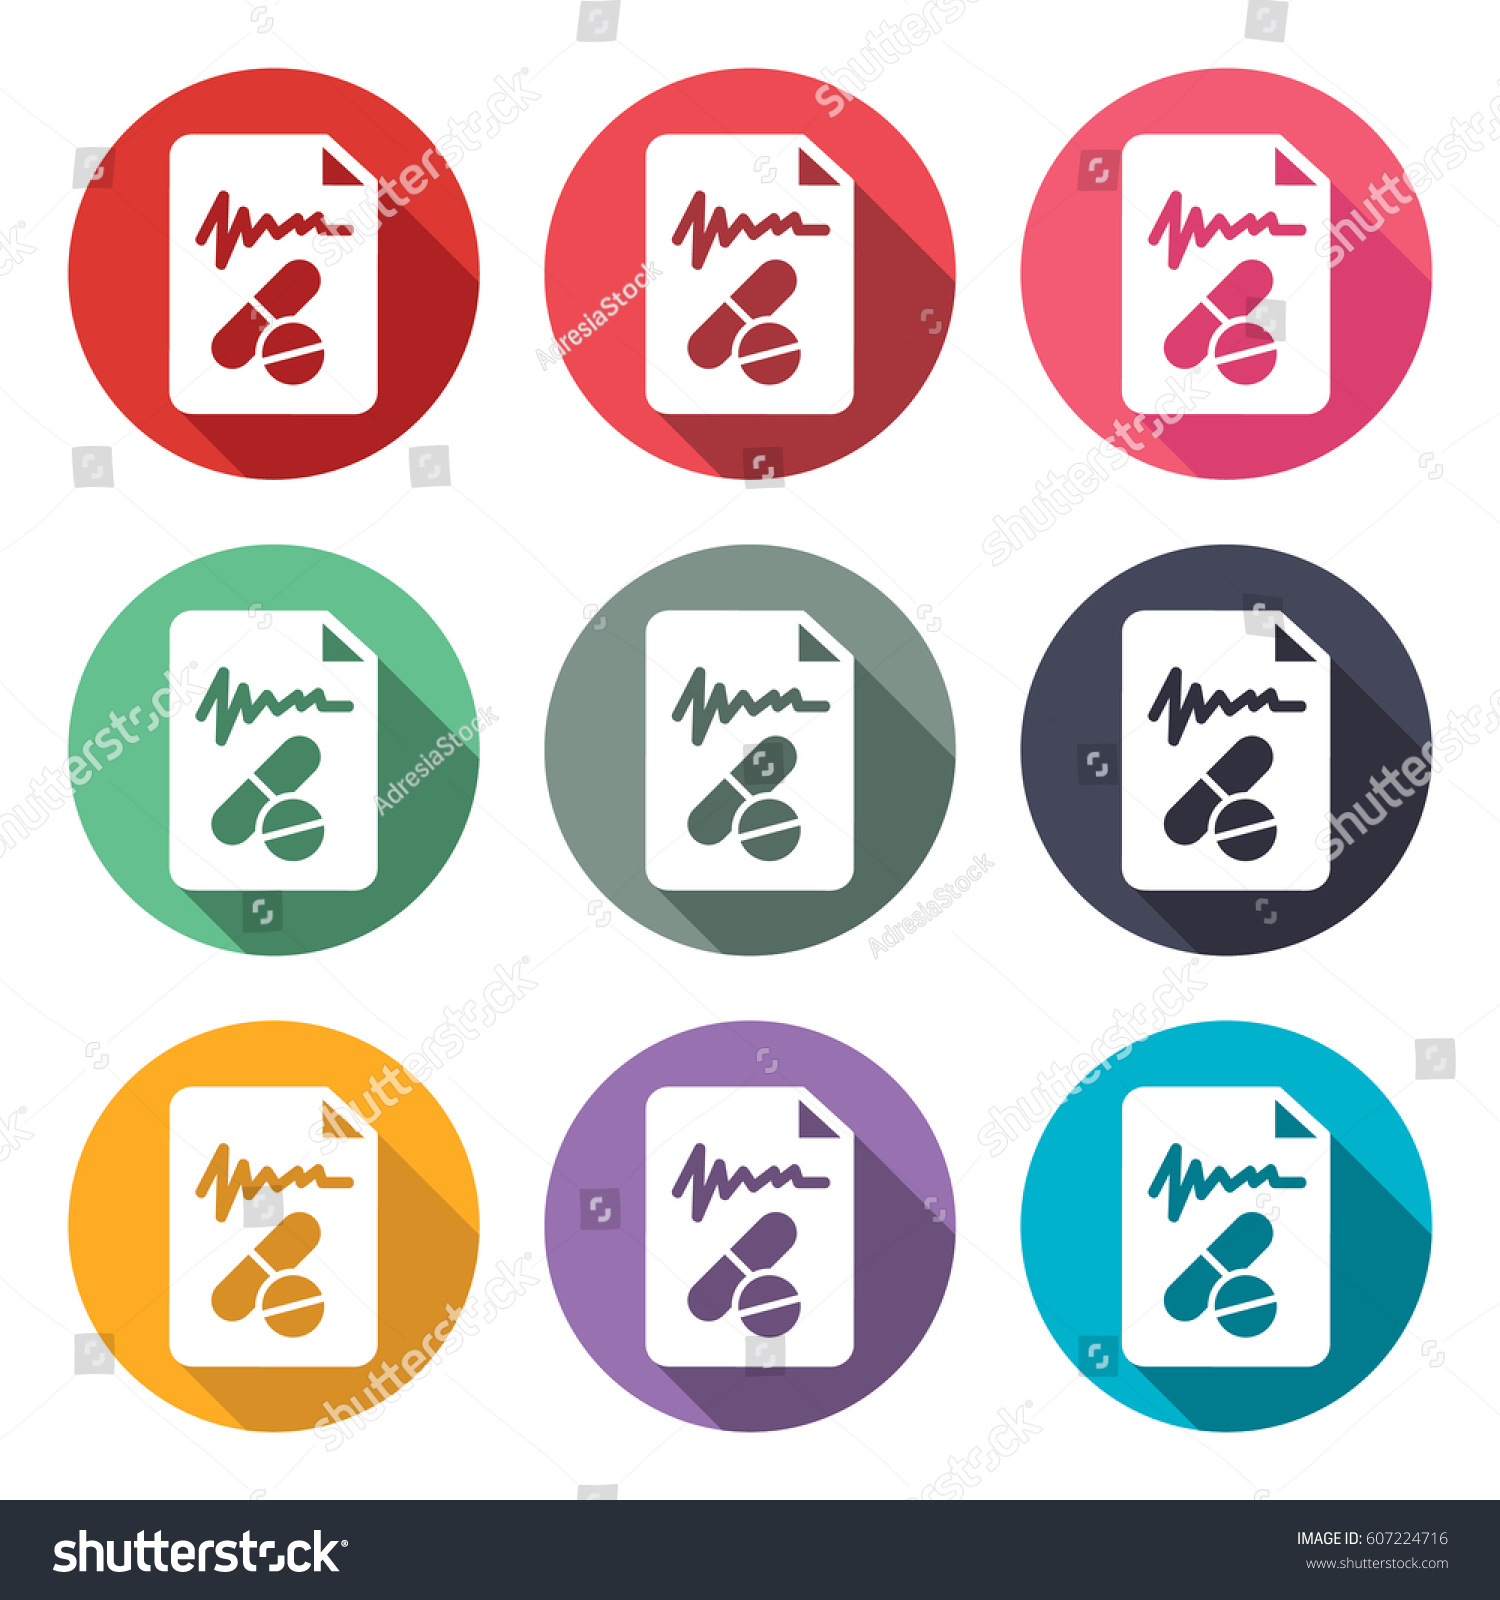 Icon Illustrations Prescription Medicine Doctor Stock Vector